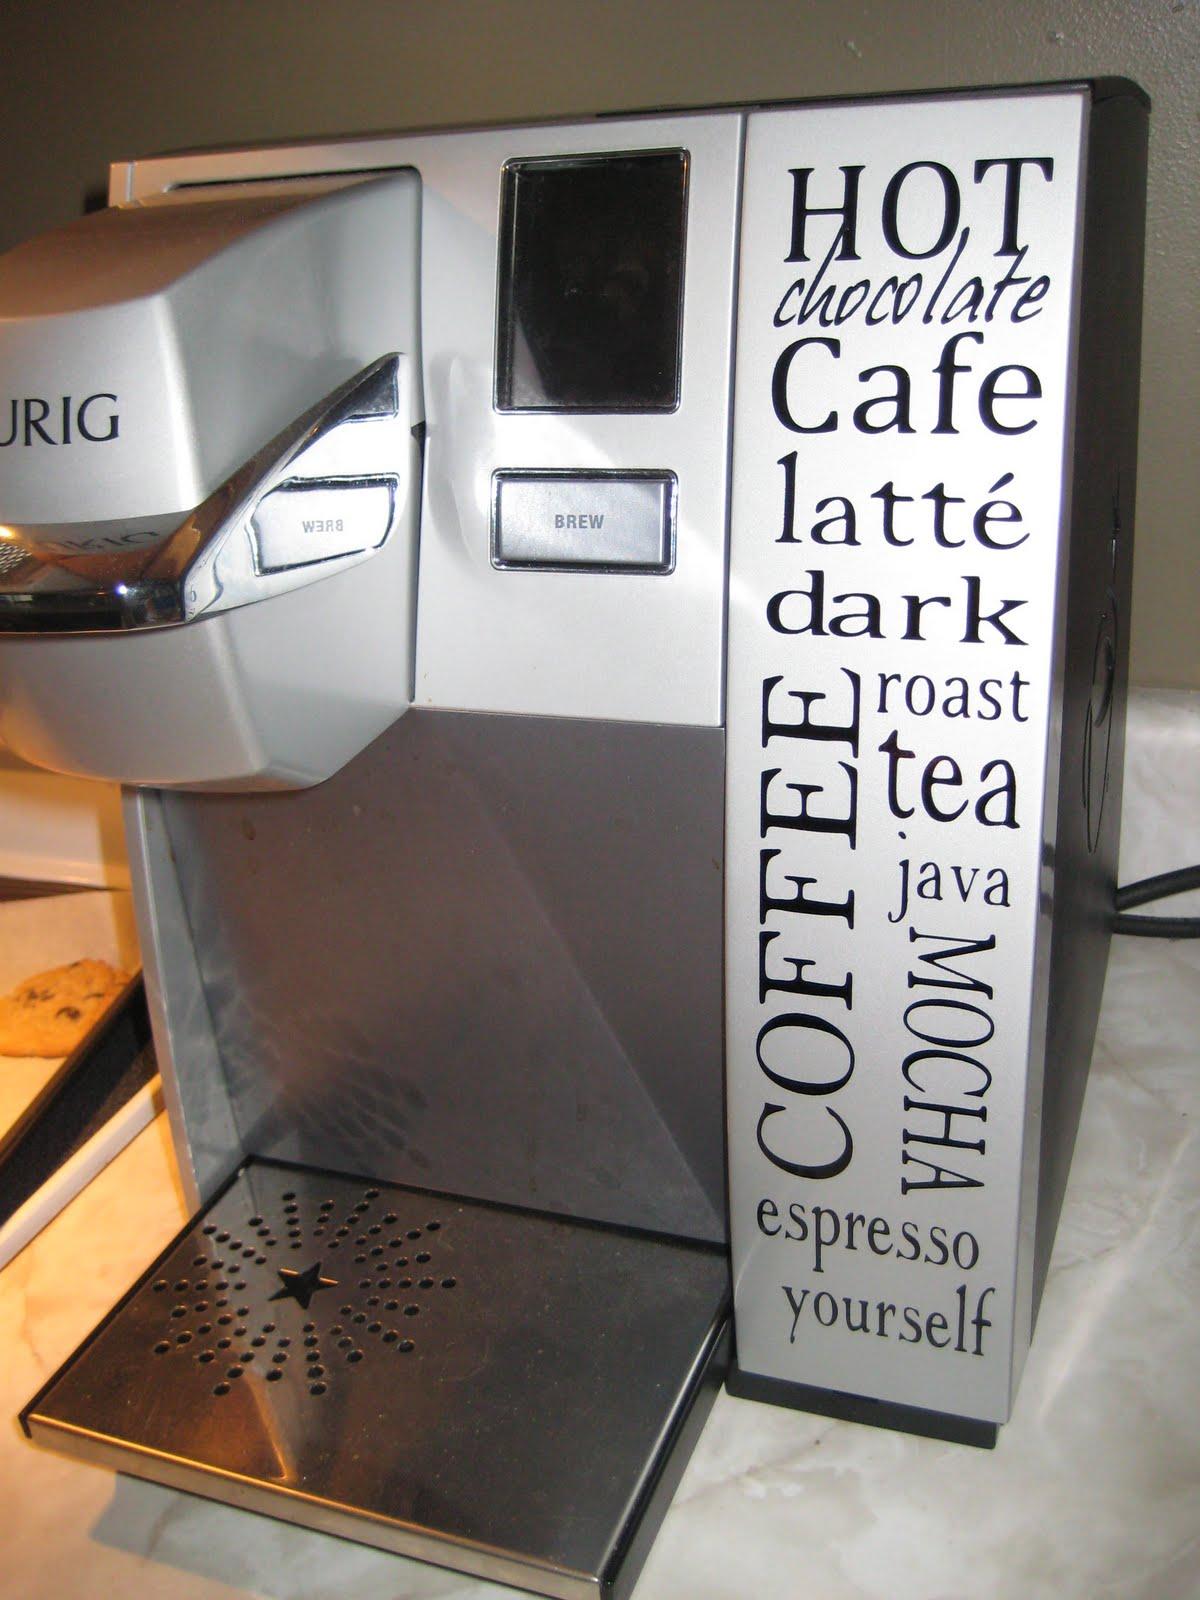 subway art for keurig coffee hot chocolate machines. Black Bedroom Furniture Sets. Home Design Ideas